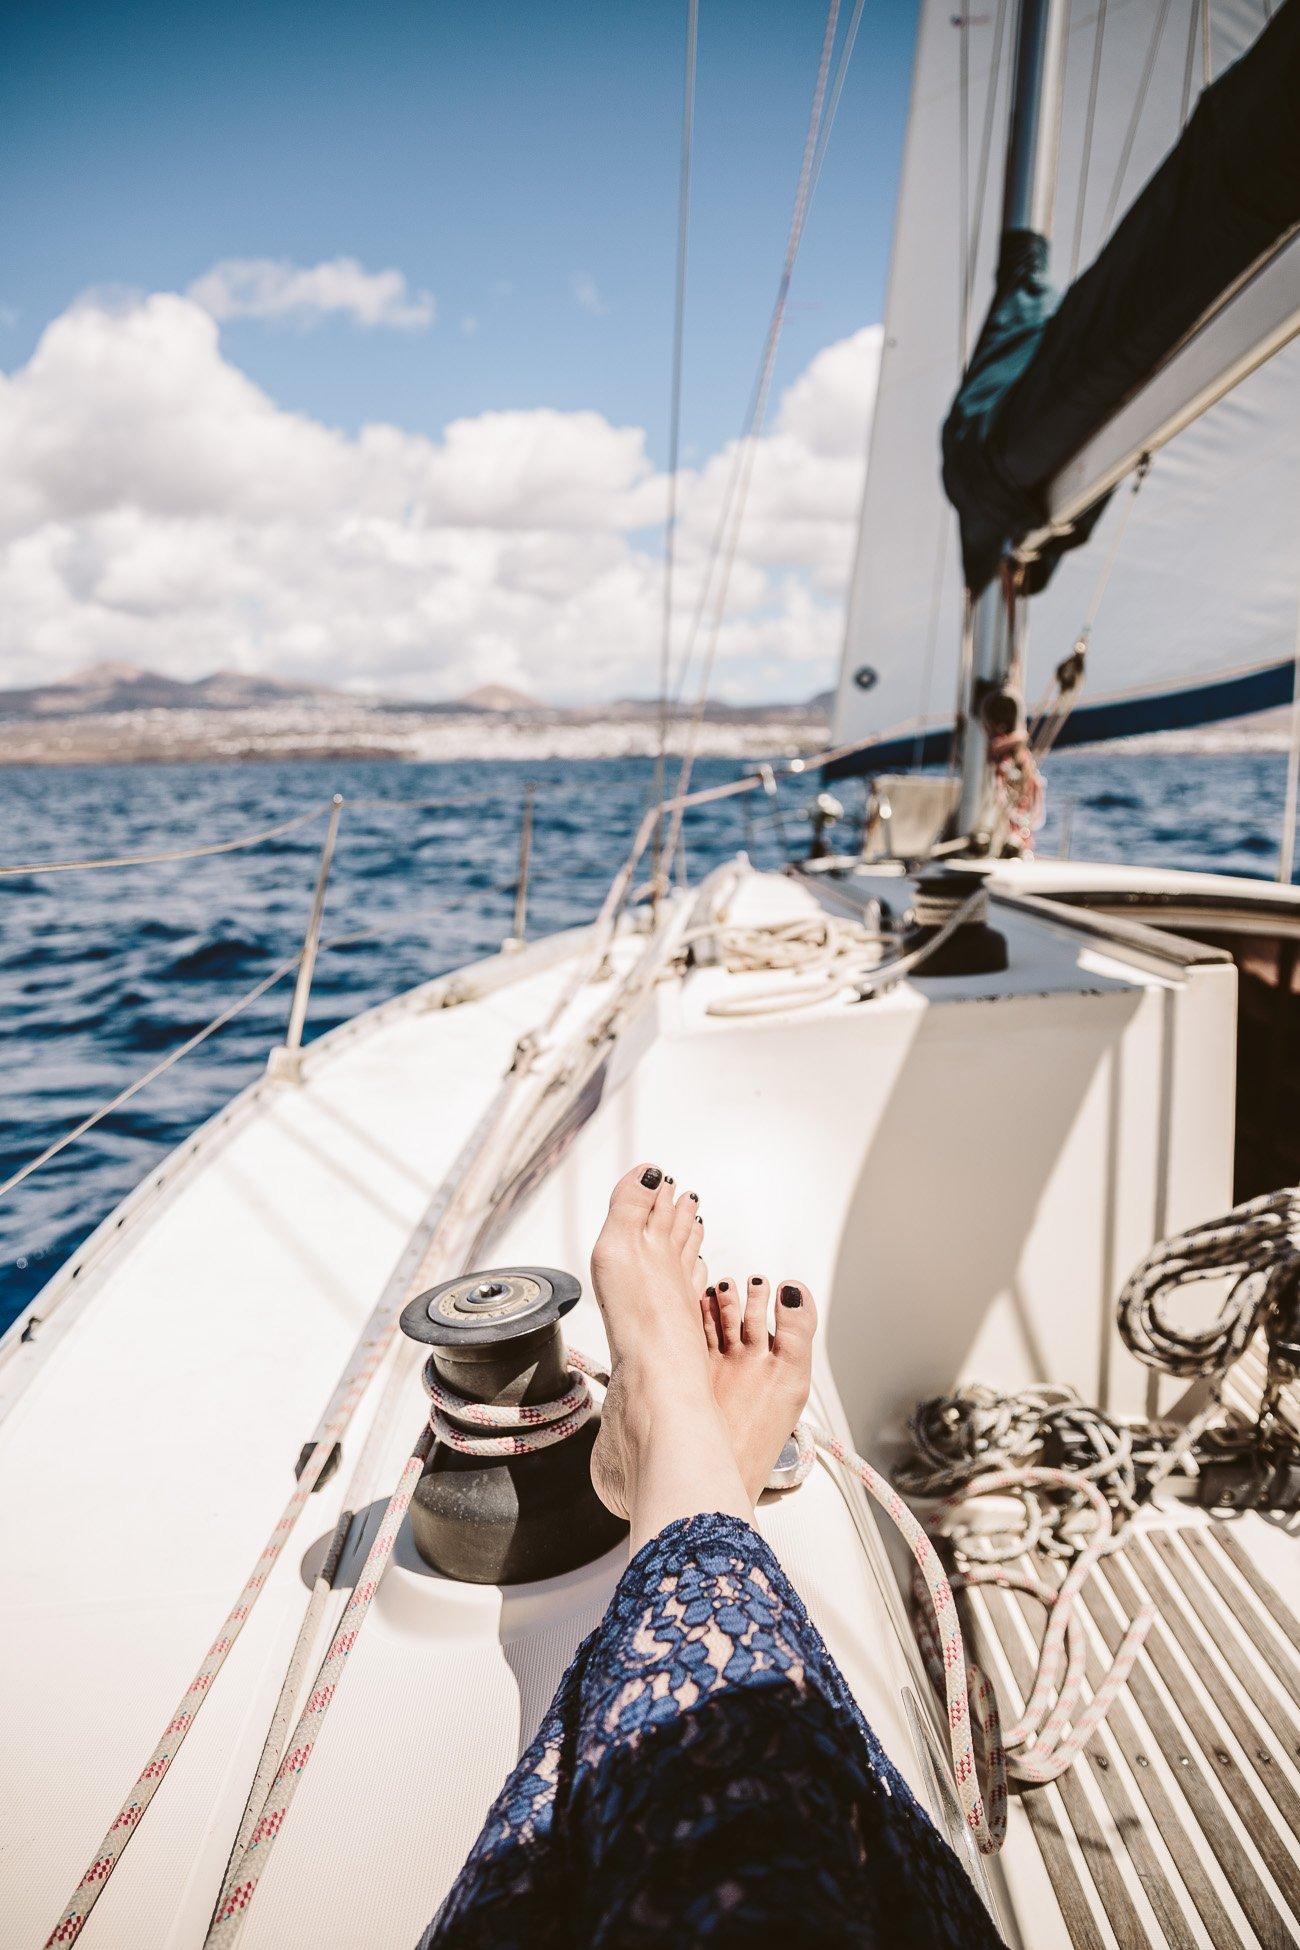 Private Sailing Tour of Lanzarote